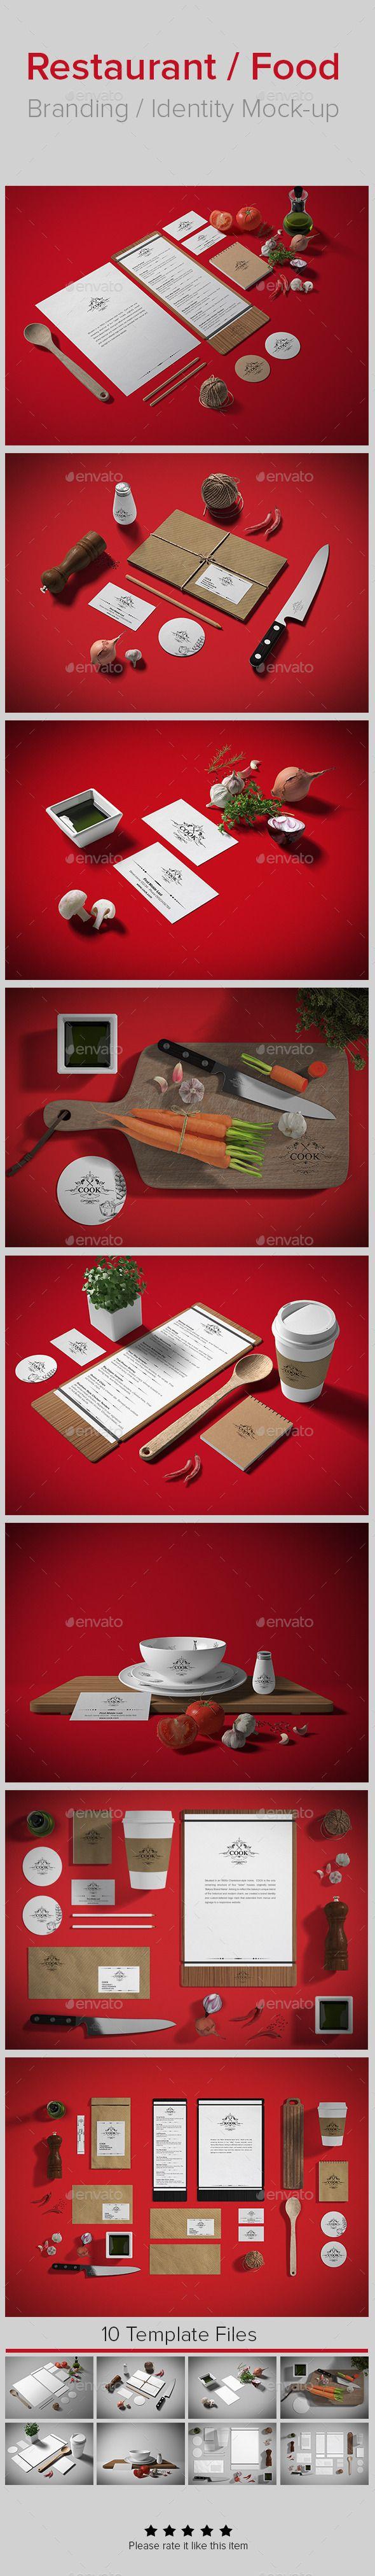 Restaurant Food Branding Identity Mock up